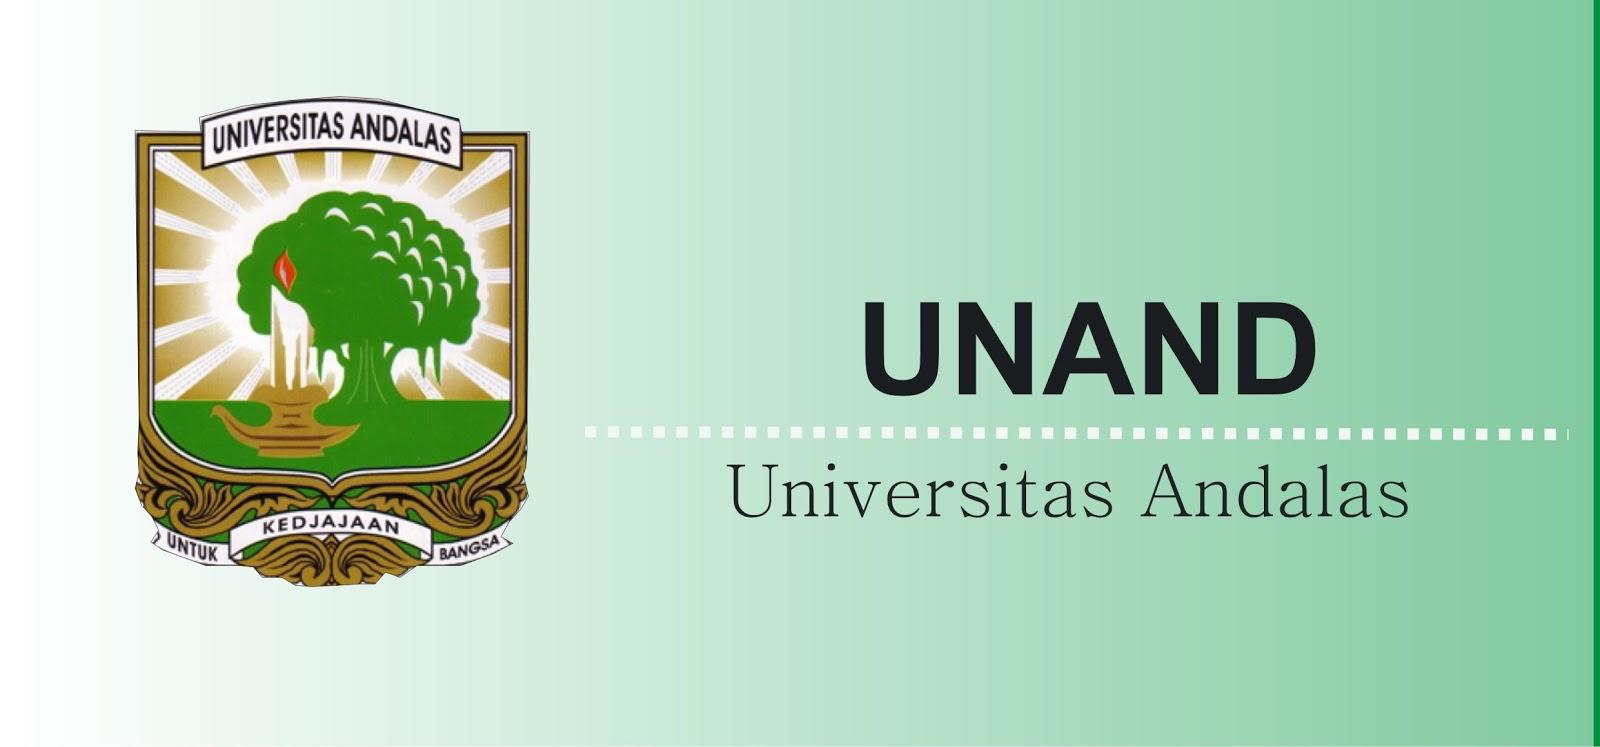 Pembuatan Jersey Futsal UNIVERSITAS ANDALAS / UNAND